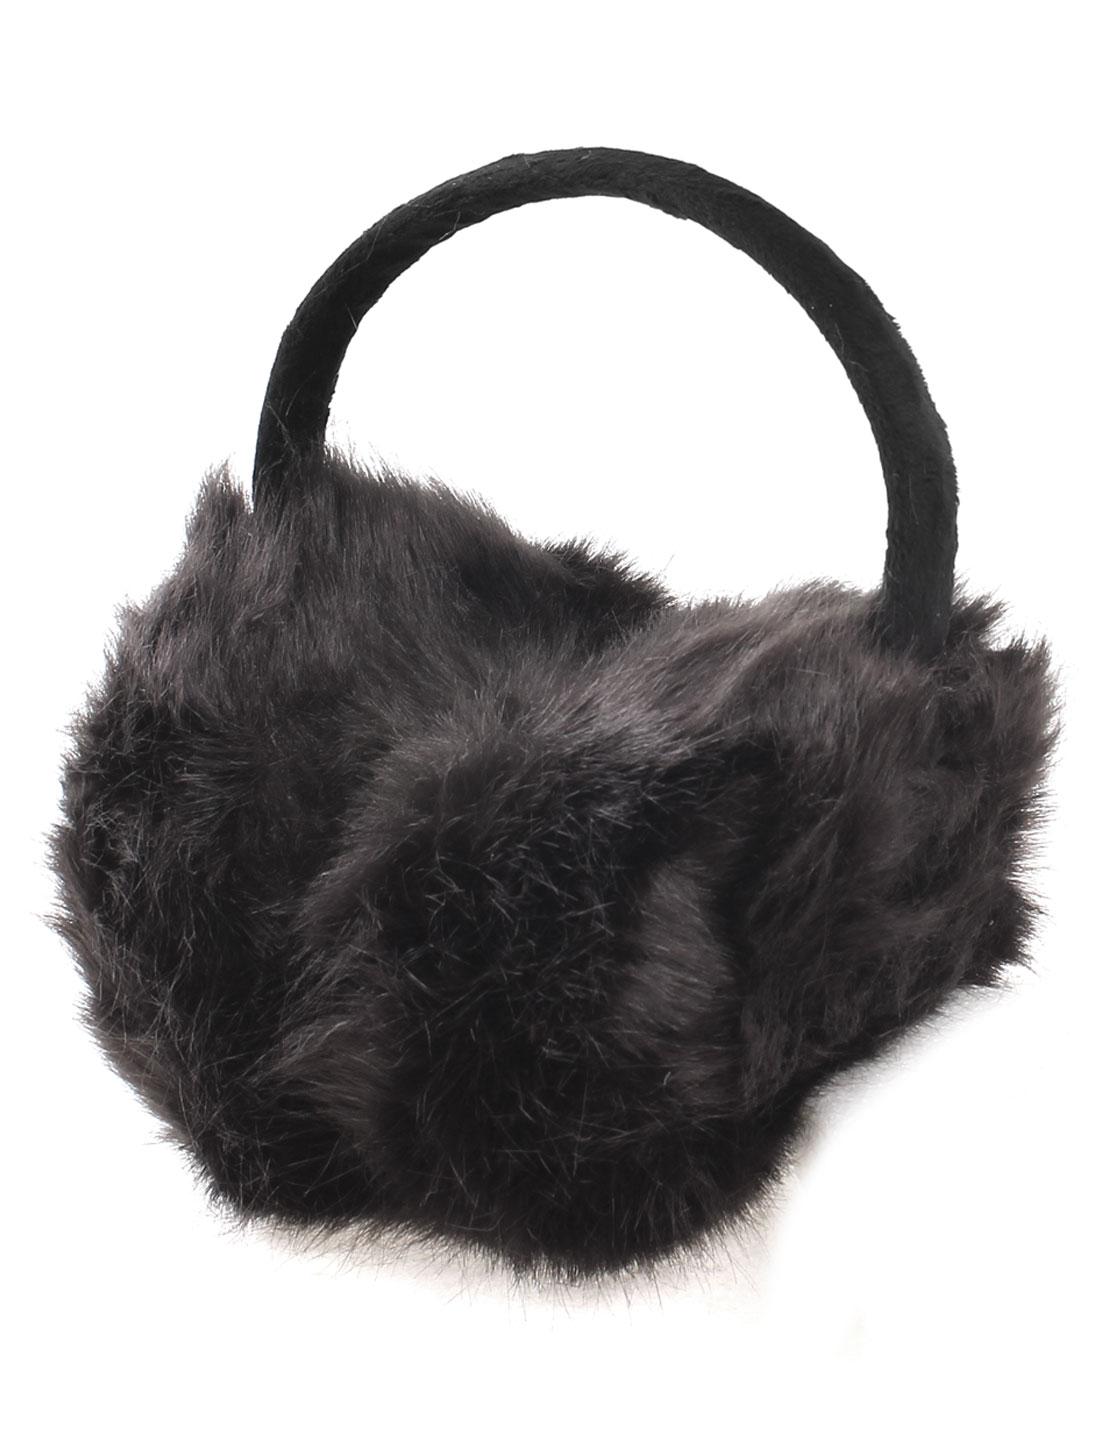 Outdoor Plush Warmer Headband Ear Muffs Earmuffs Chocolate Color for Girl